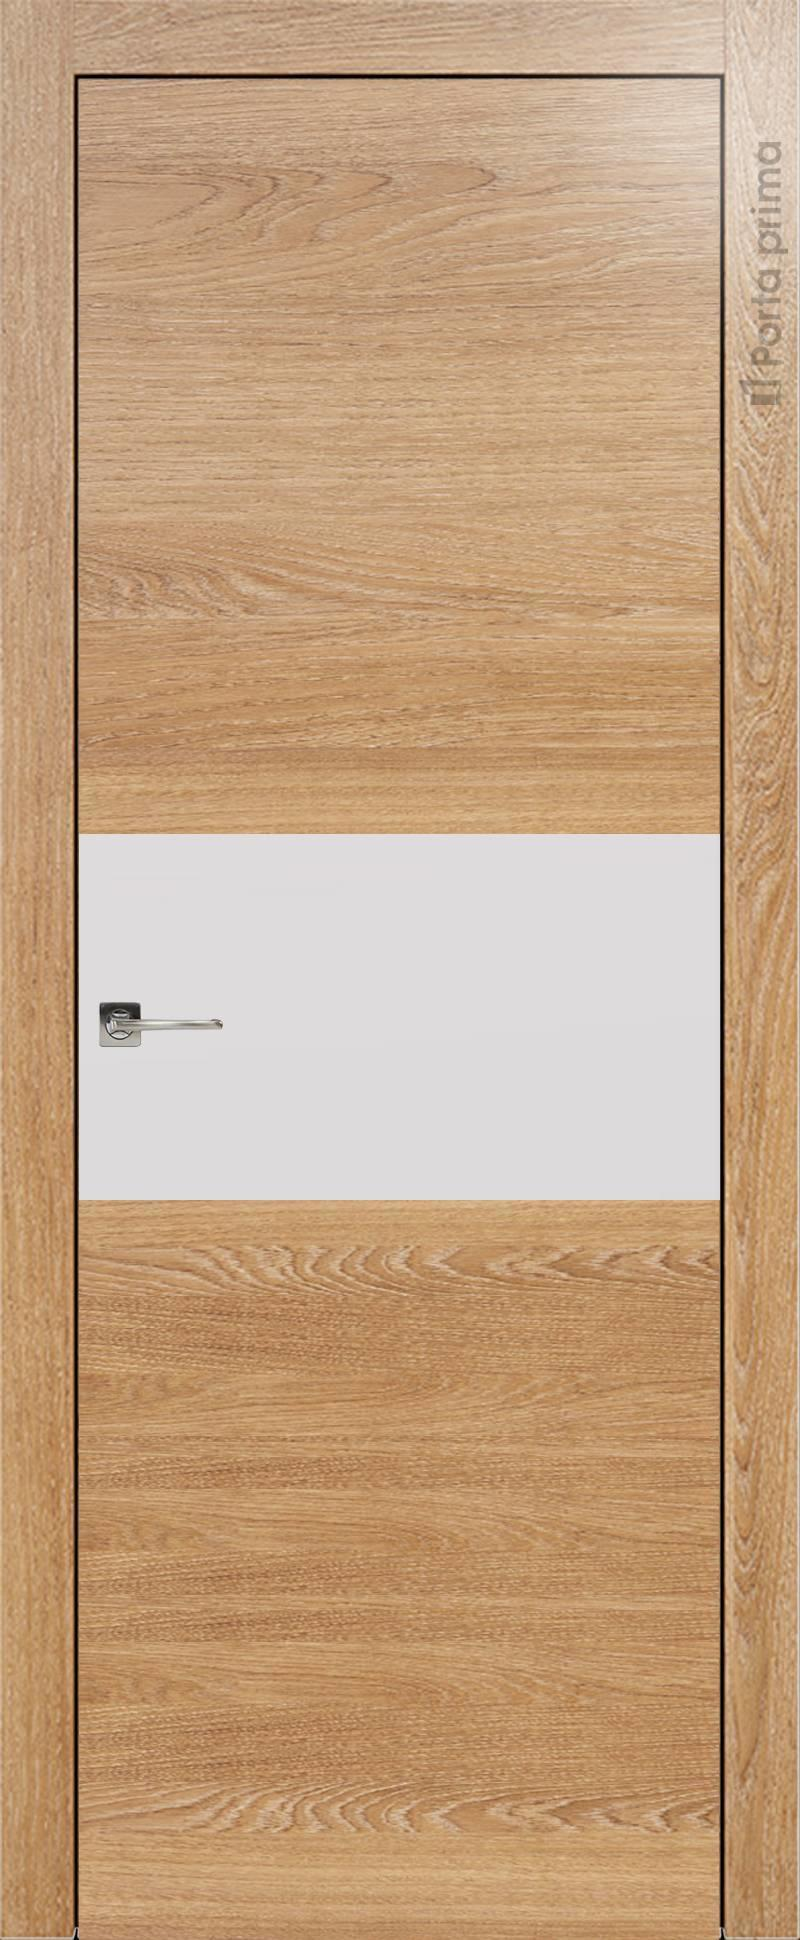 Tivoli Е-4 цвет - Дуб капучино Без стекла (ДГ)